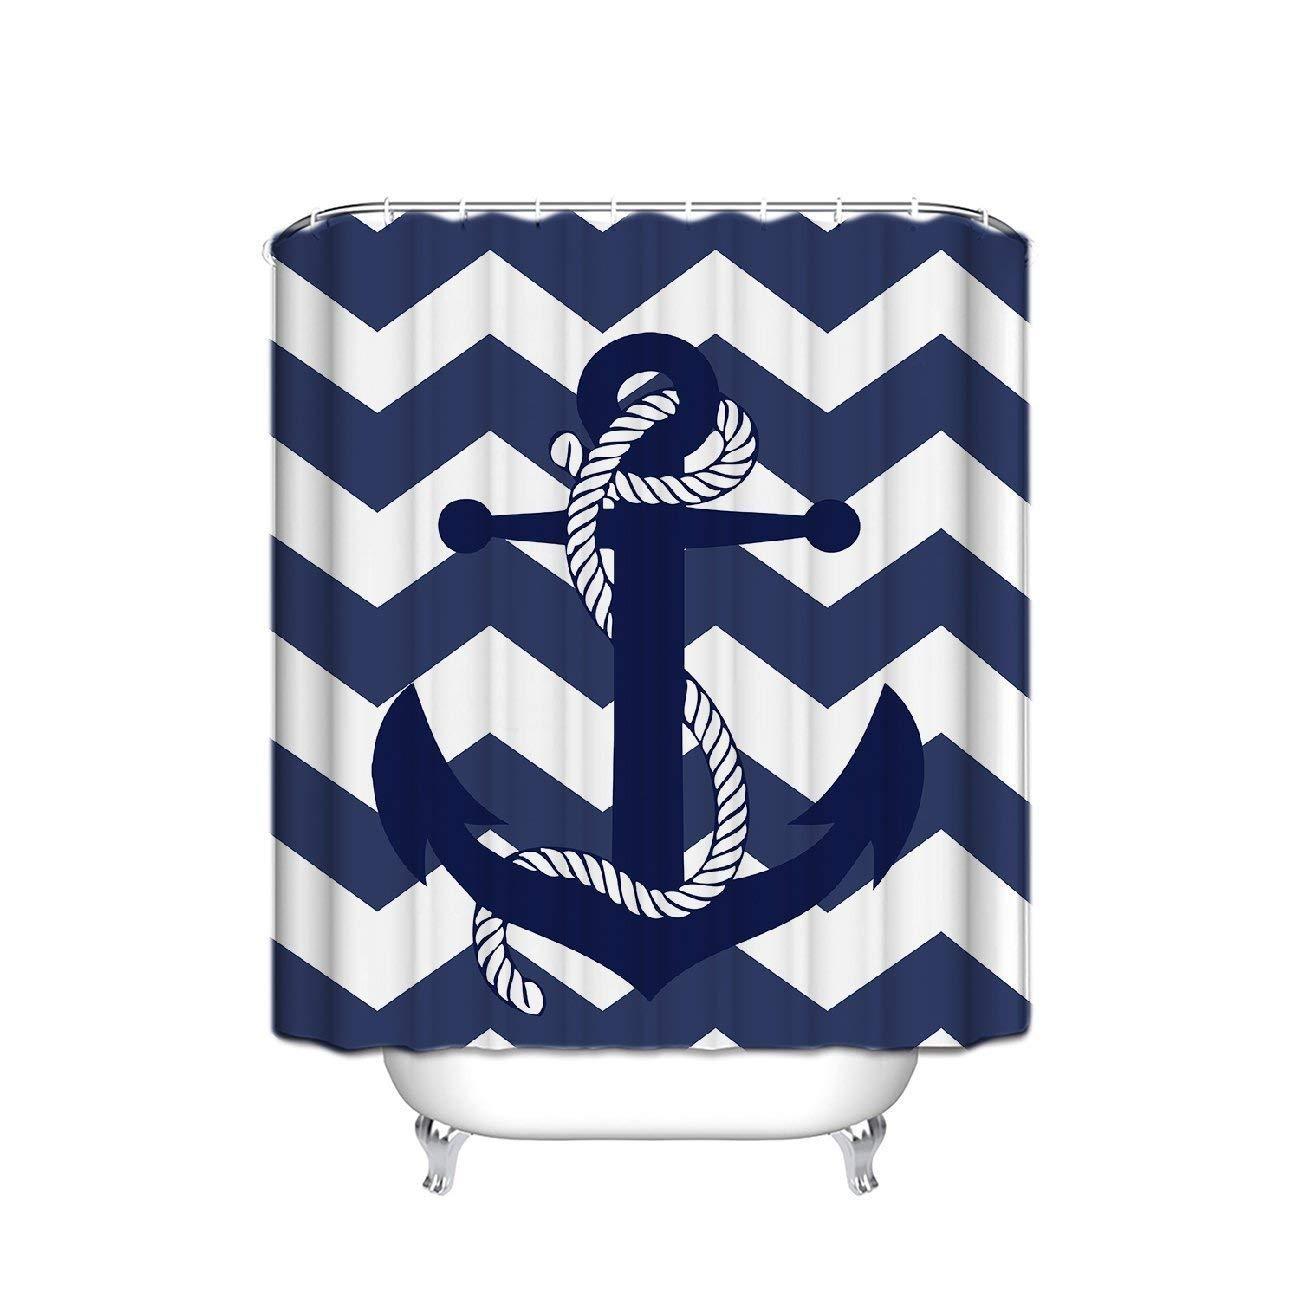 Machine Washable,Hooks Included,Bathroom Decoration Original Design Elegance Chevron Pattern Zig Zag 72 W x 84 H T/&H Home Elepant Shower Curtain Fabric Art Print Polyester Fabric,Waterproof